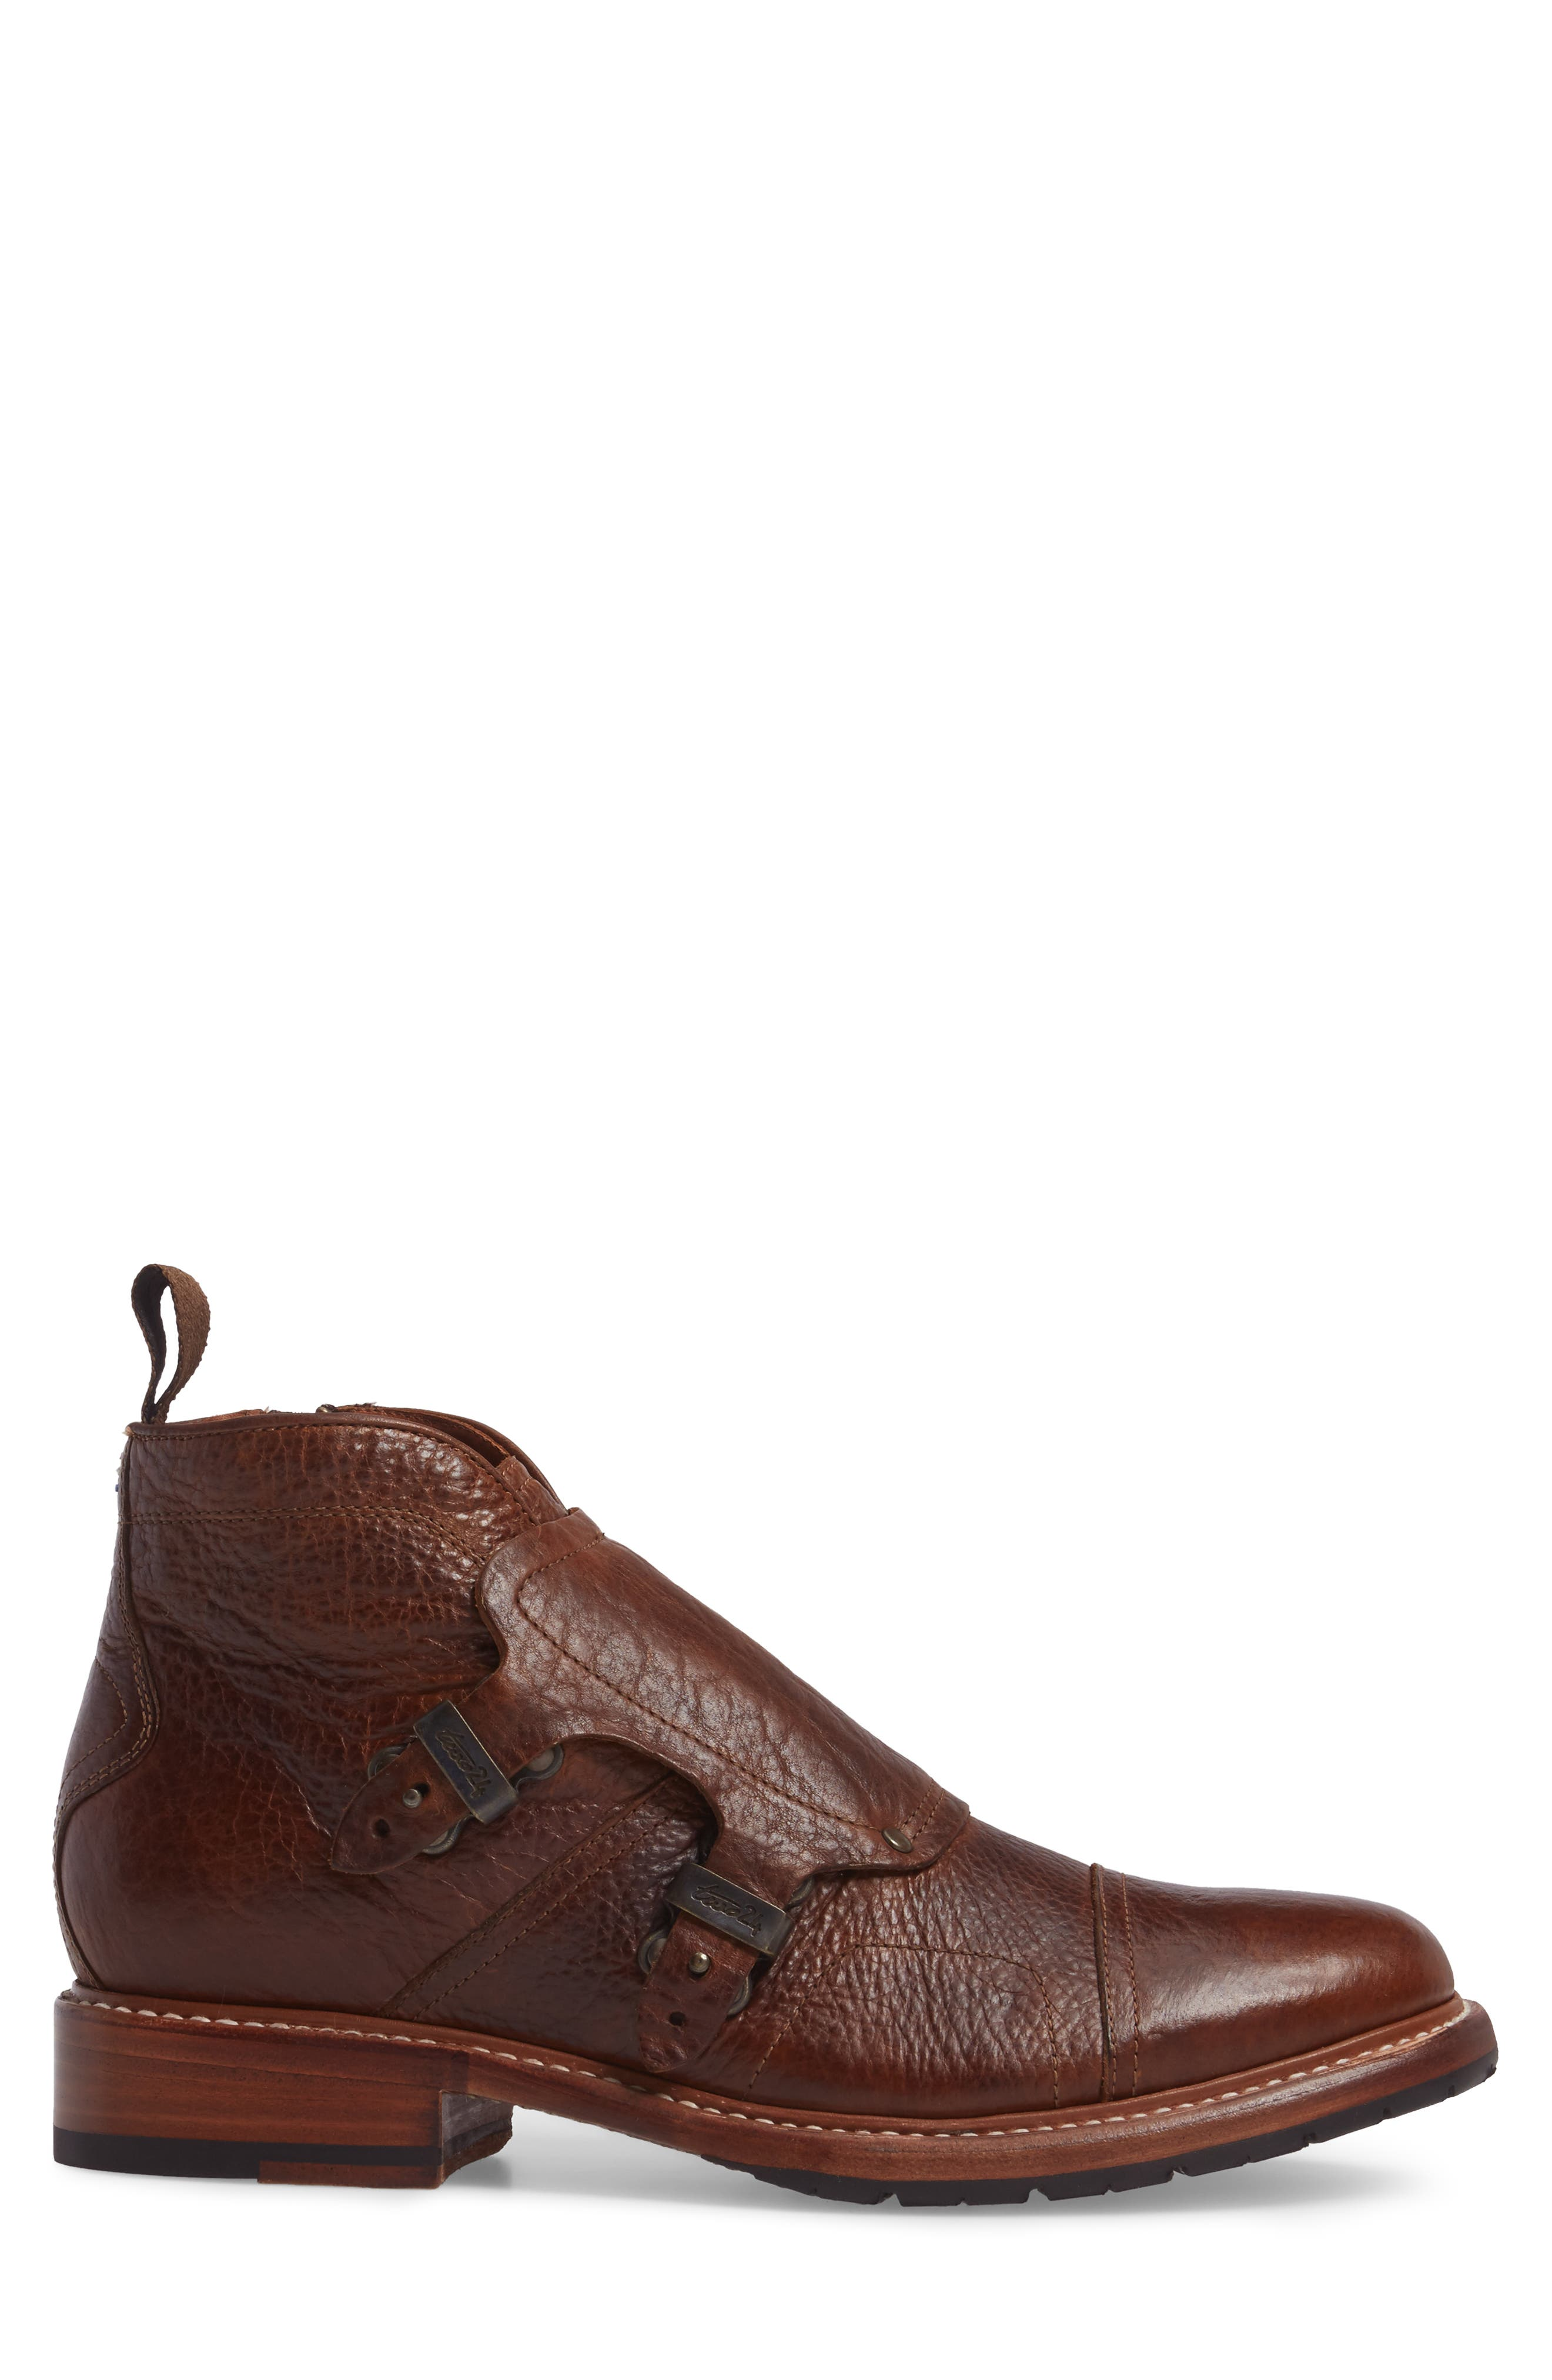 Montclair Zip Boot,                             Alternate thumbnail 3, color,                             Brown Leather